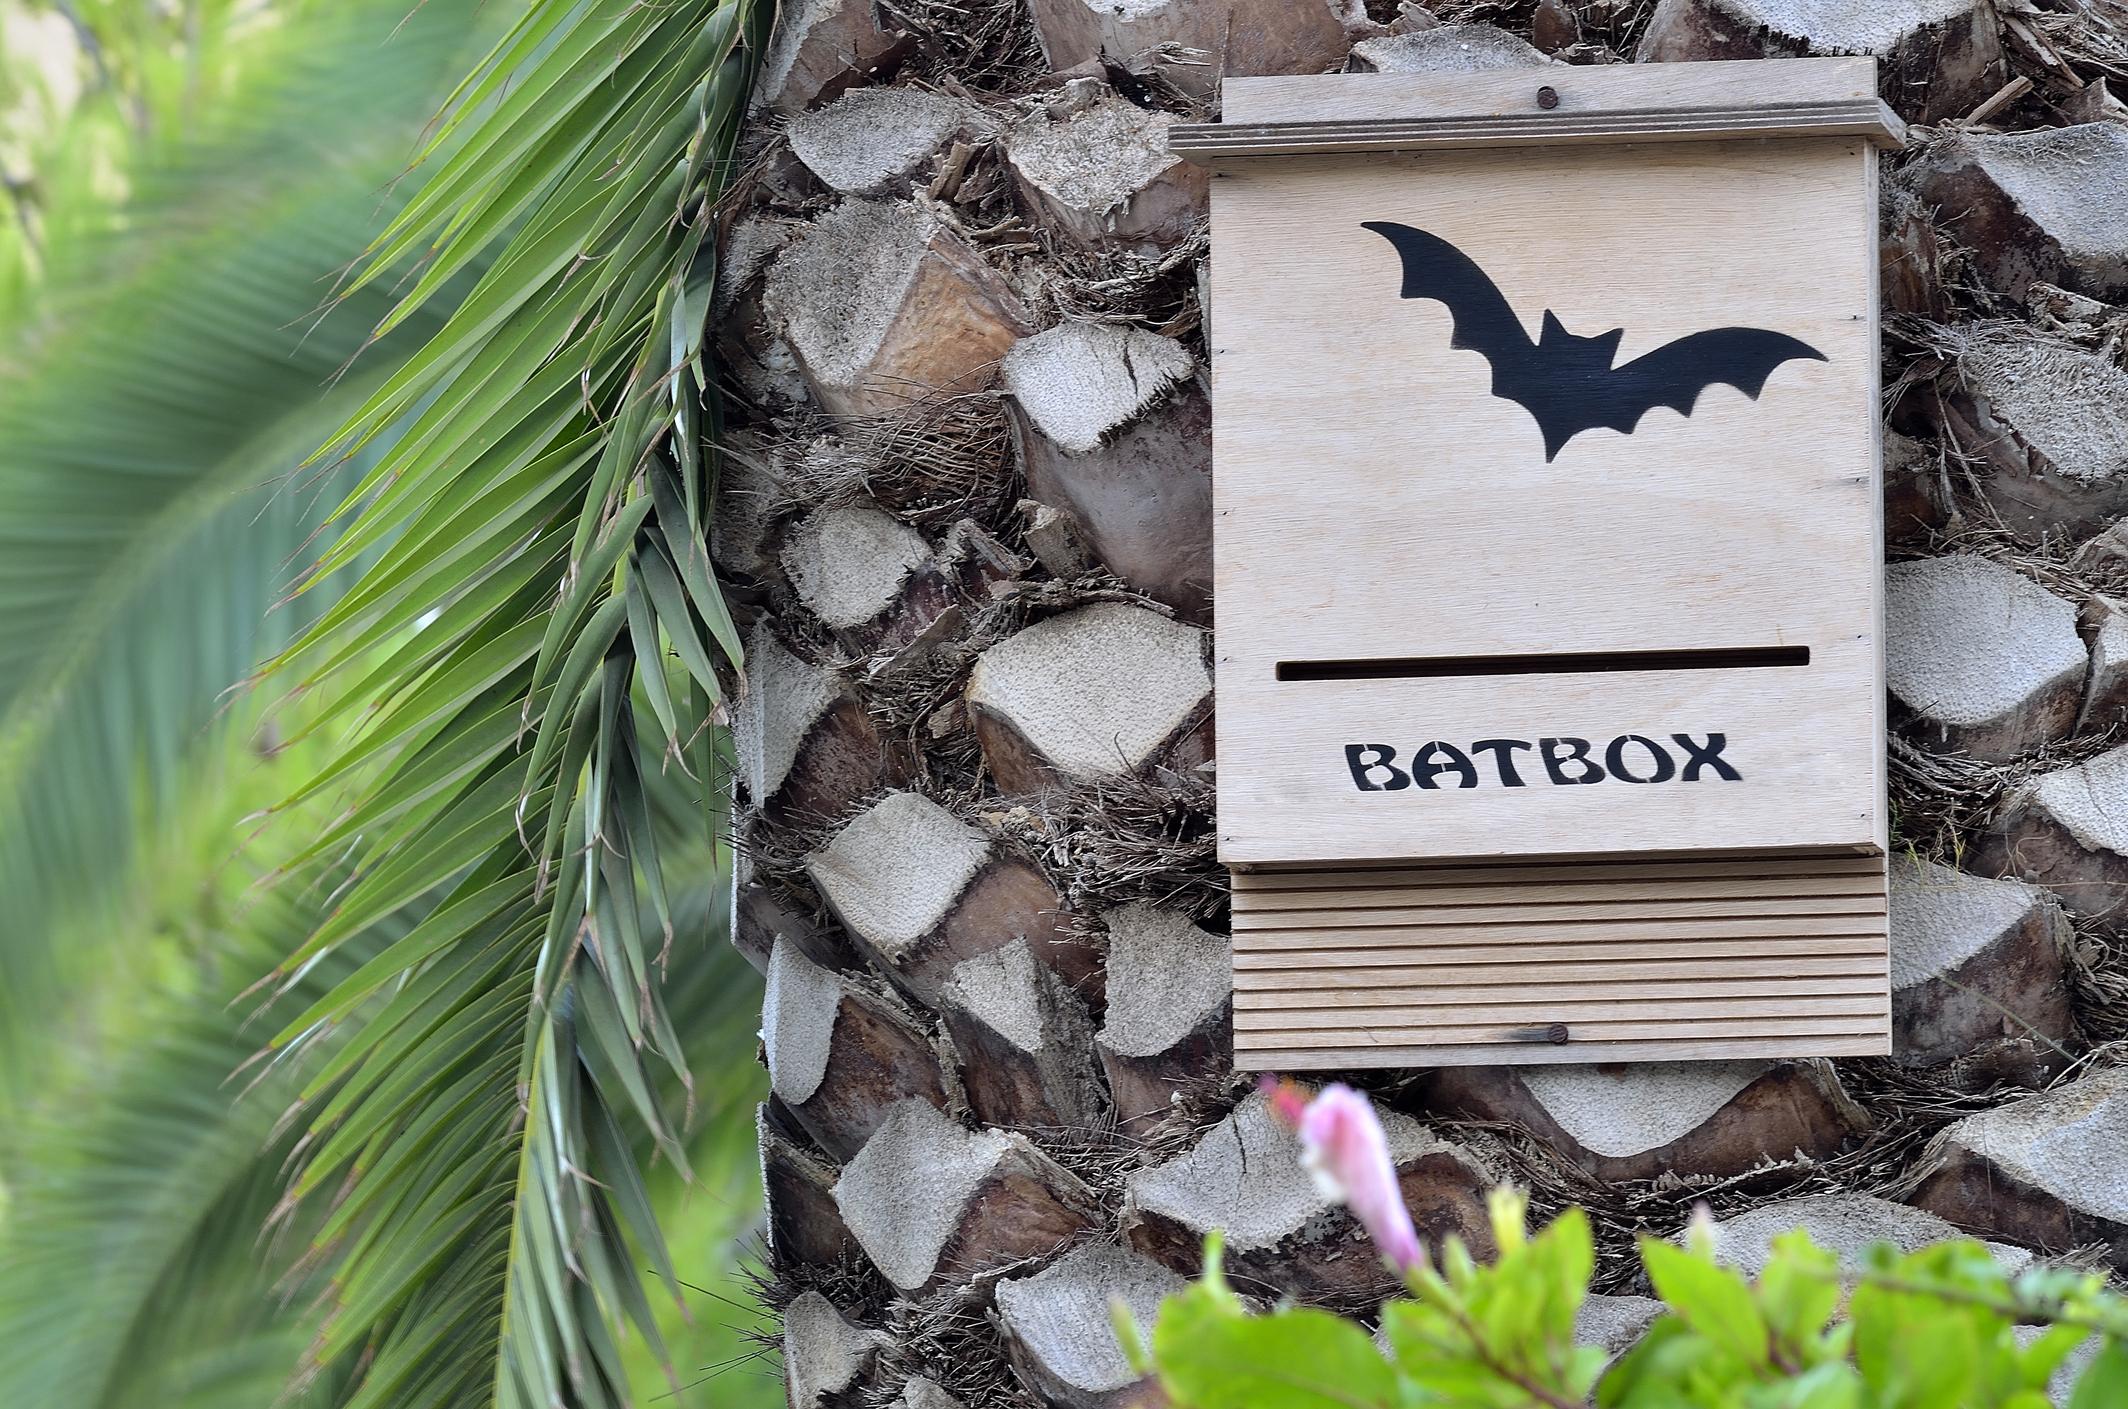 bat-exclusion-bat-box.jpg